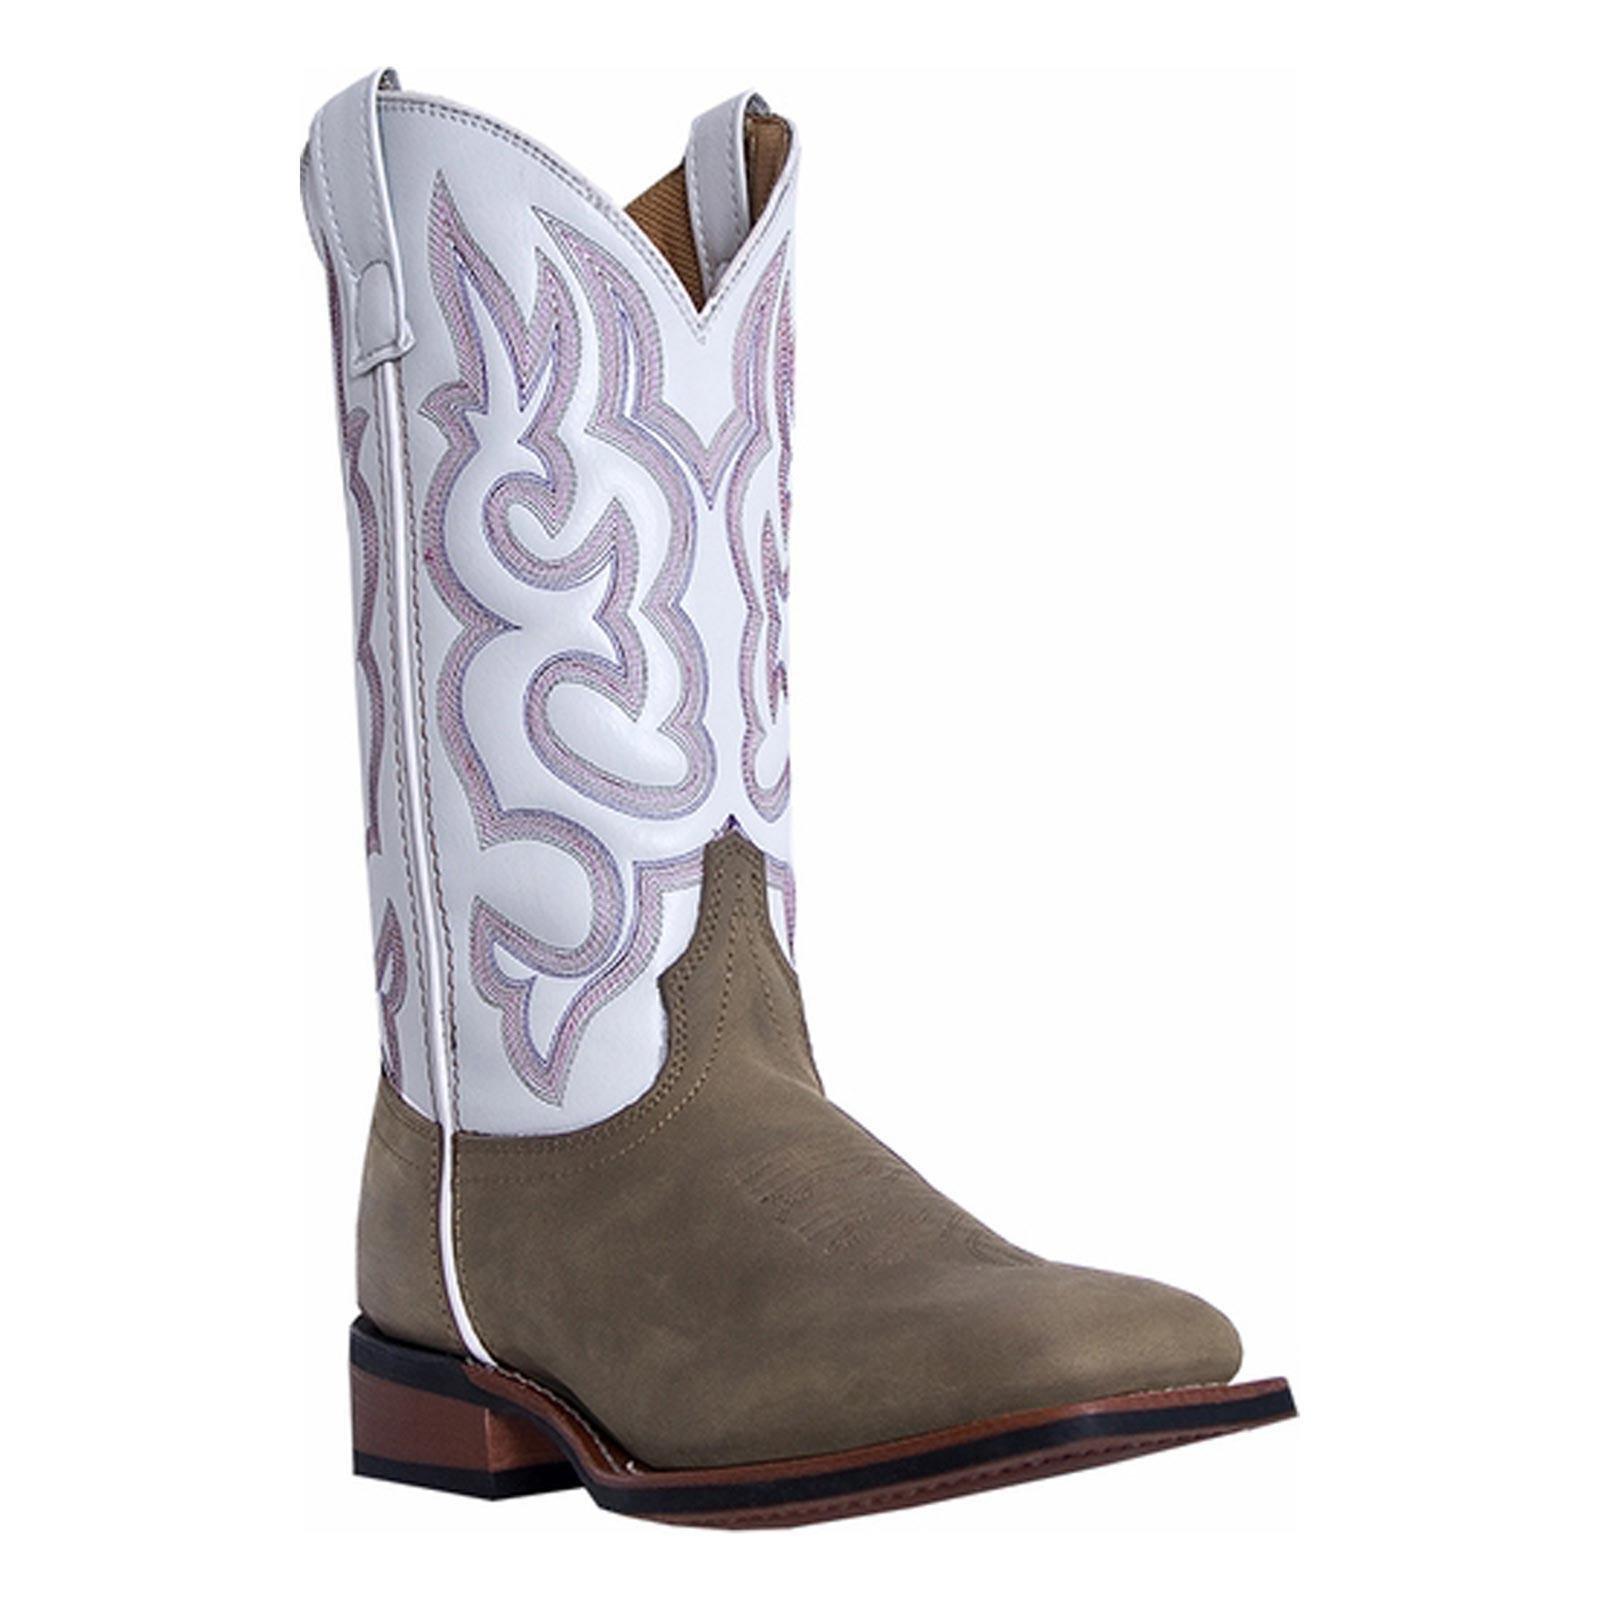 Laredo Women's Mesquite Western Boot, Taupe/White, 6 M US